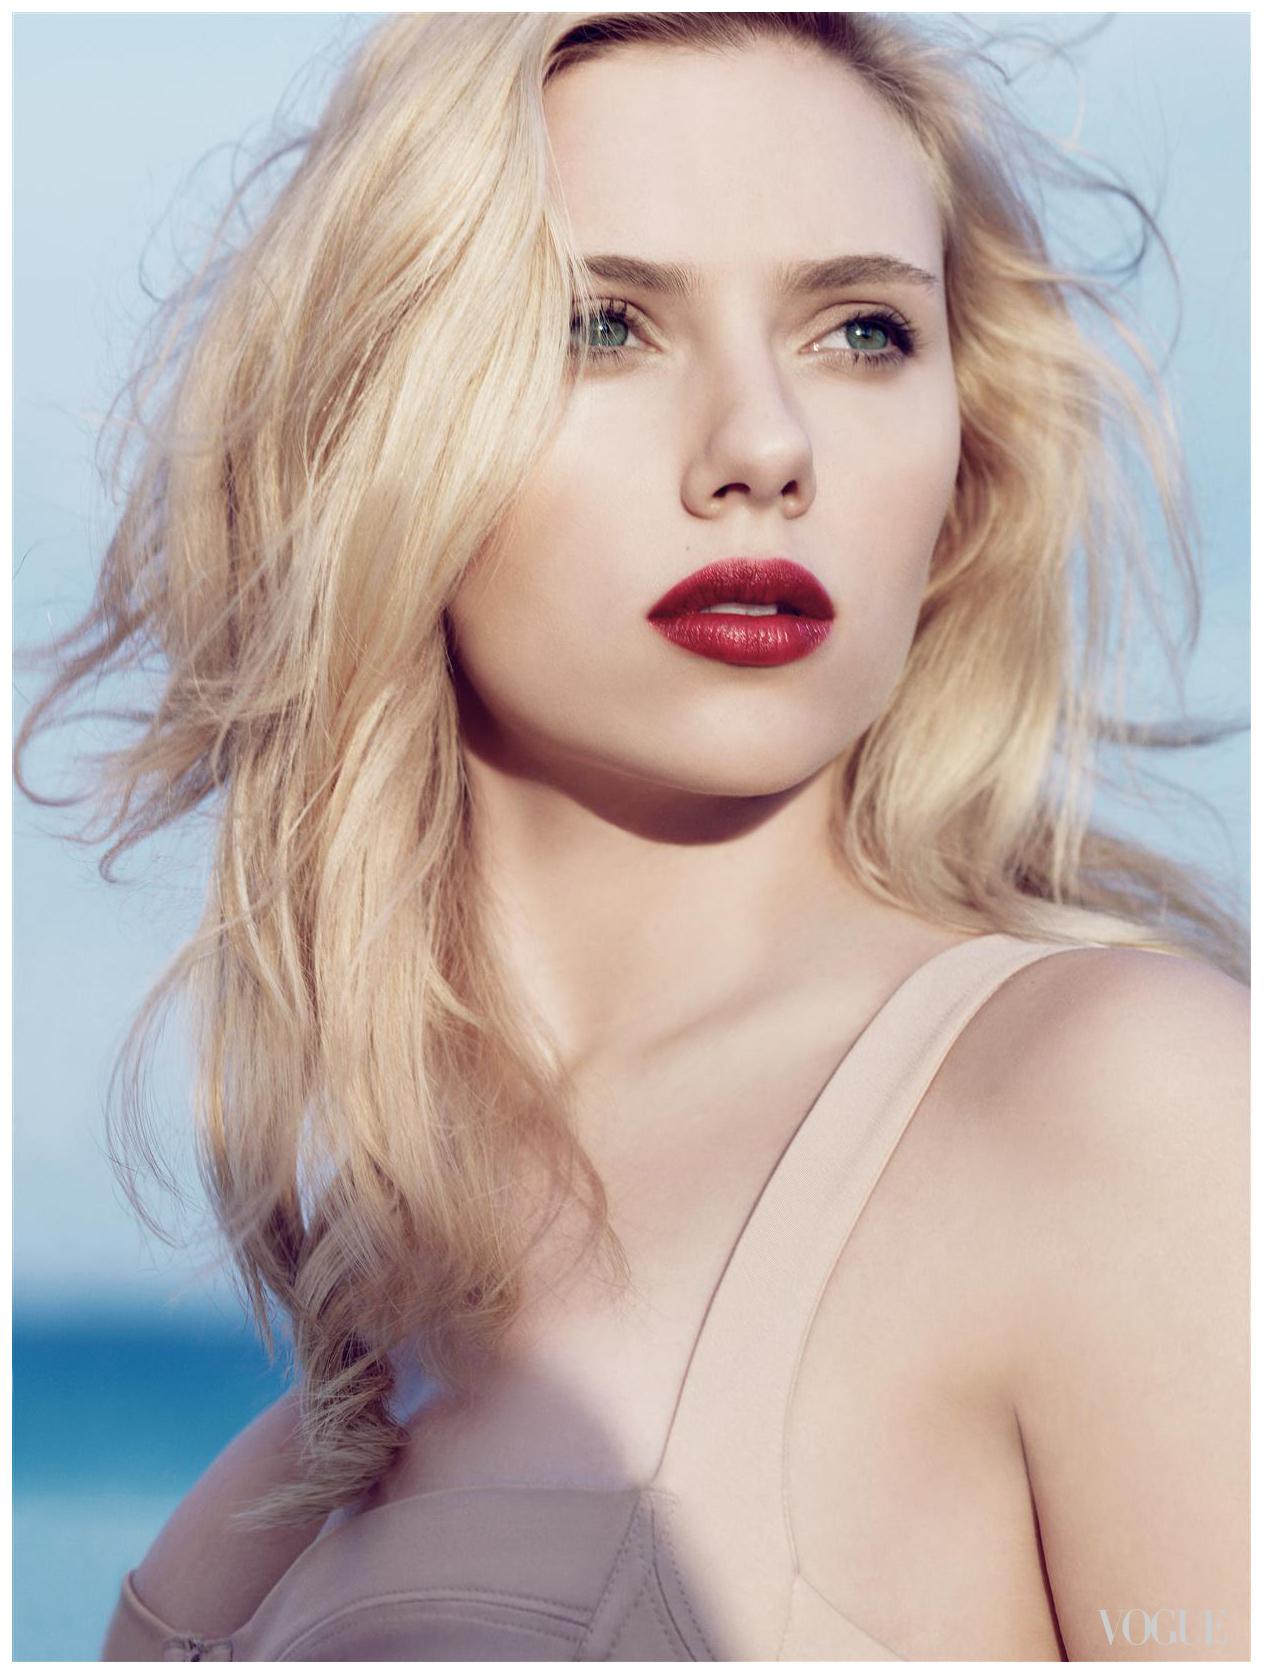 est100 一些攝影(some photos): Scarlett Johansson, 史嘉莉·喬韓森/ 史嘉蕾喬韓森 Скарлет Мк